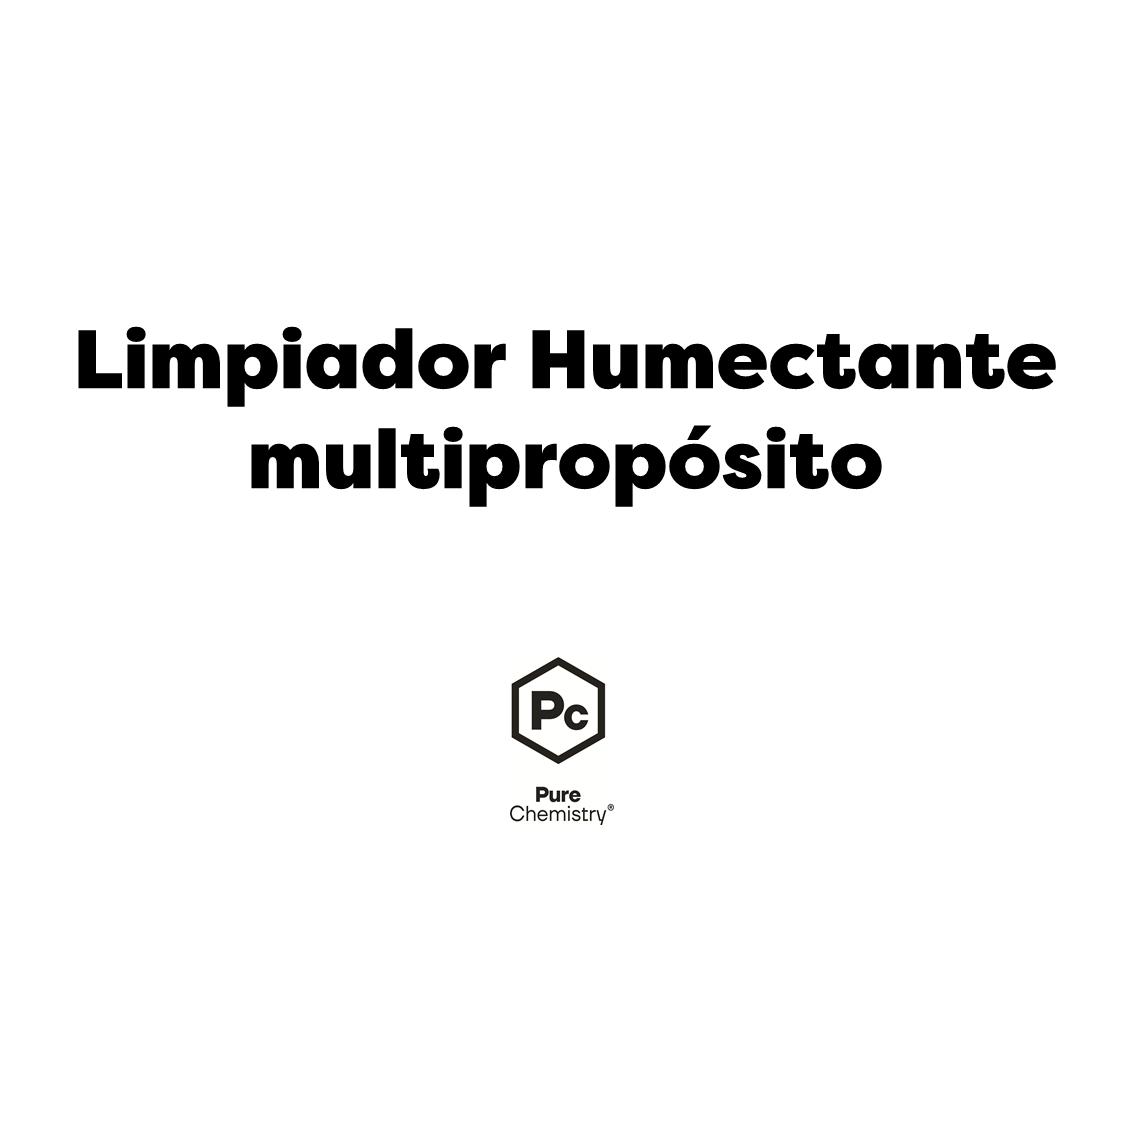 Limpiador Humectante Multipropósito - COSMOS ORGANIC ✅